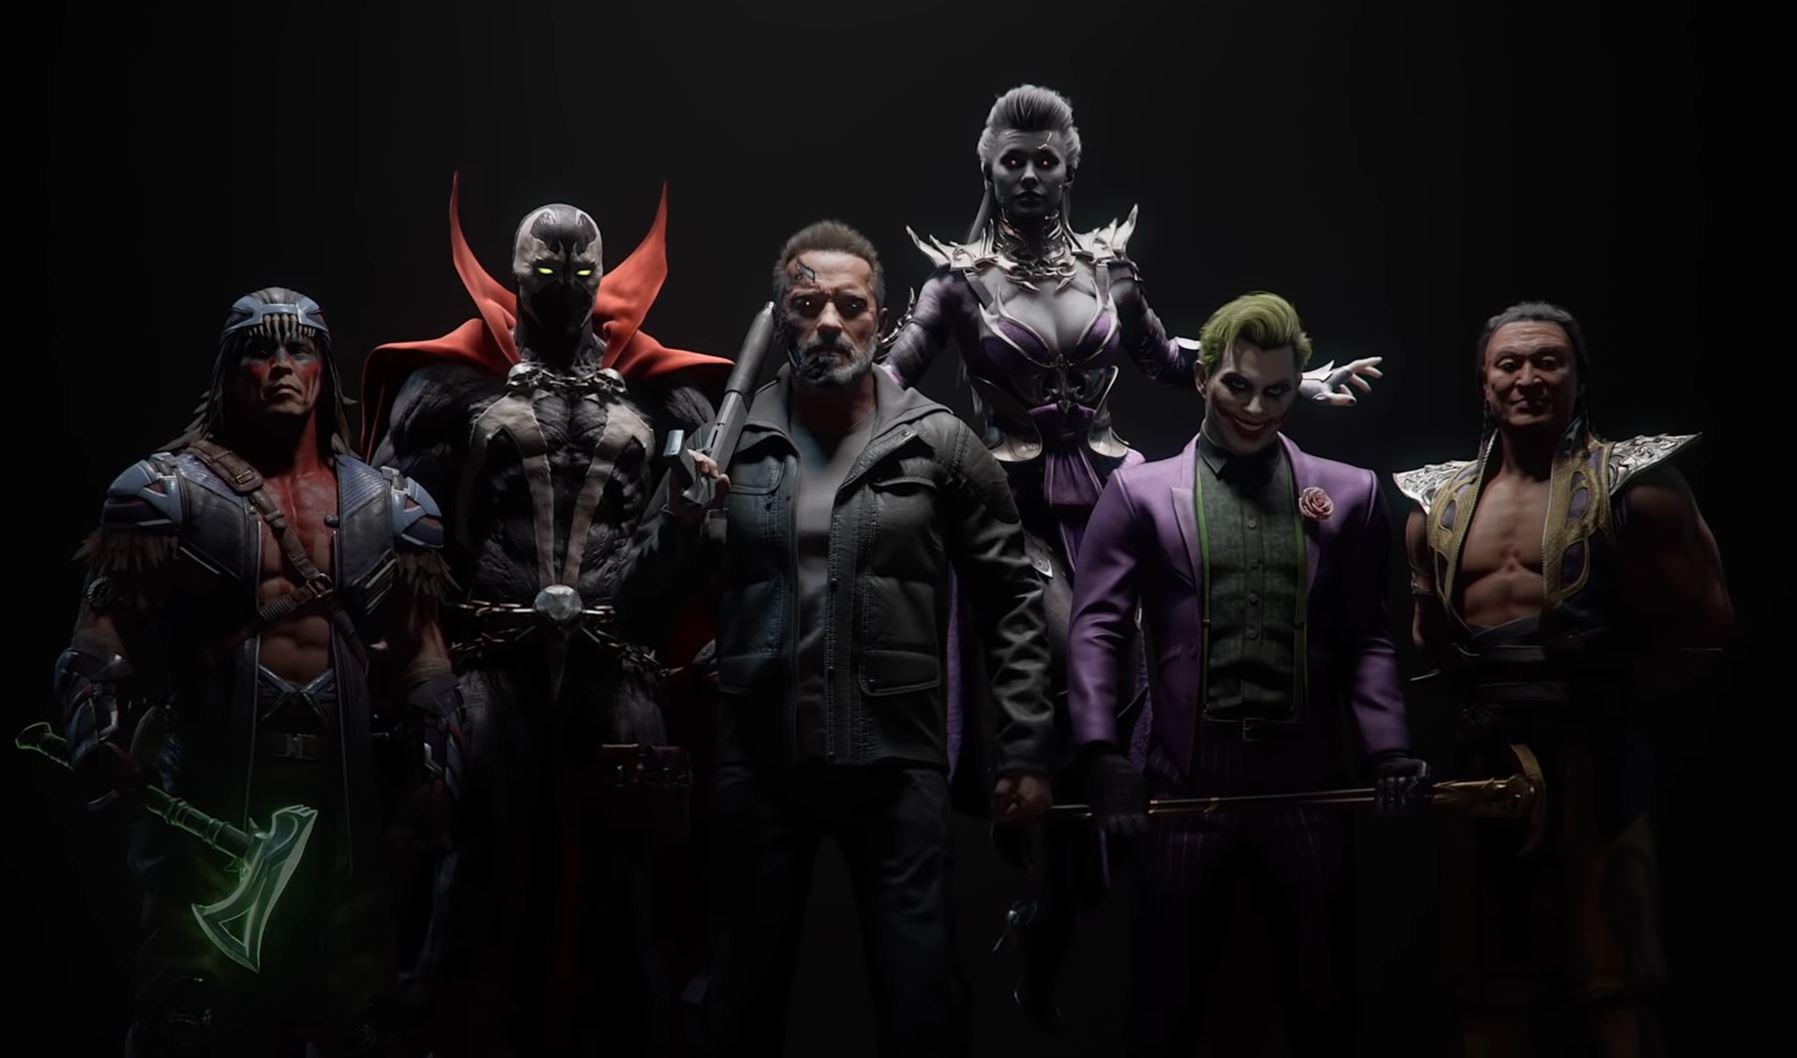 mortal kombat 11 roster 2020